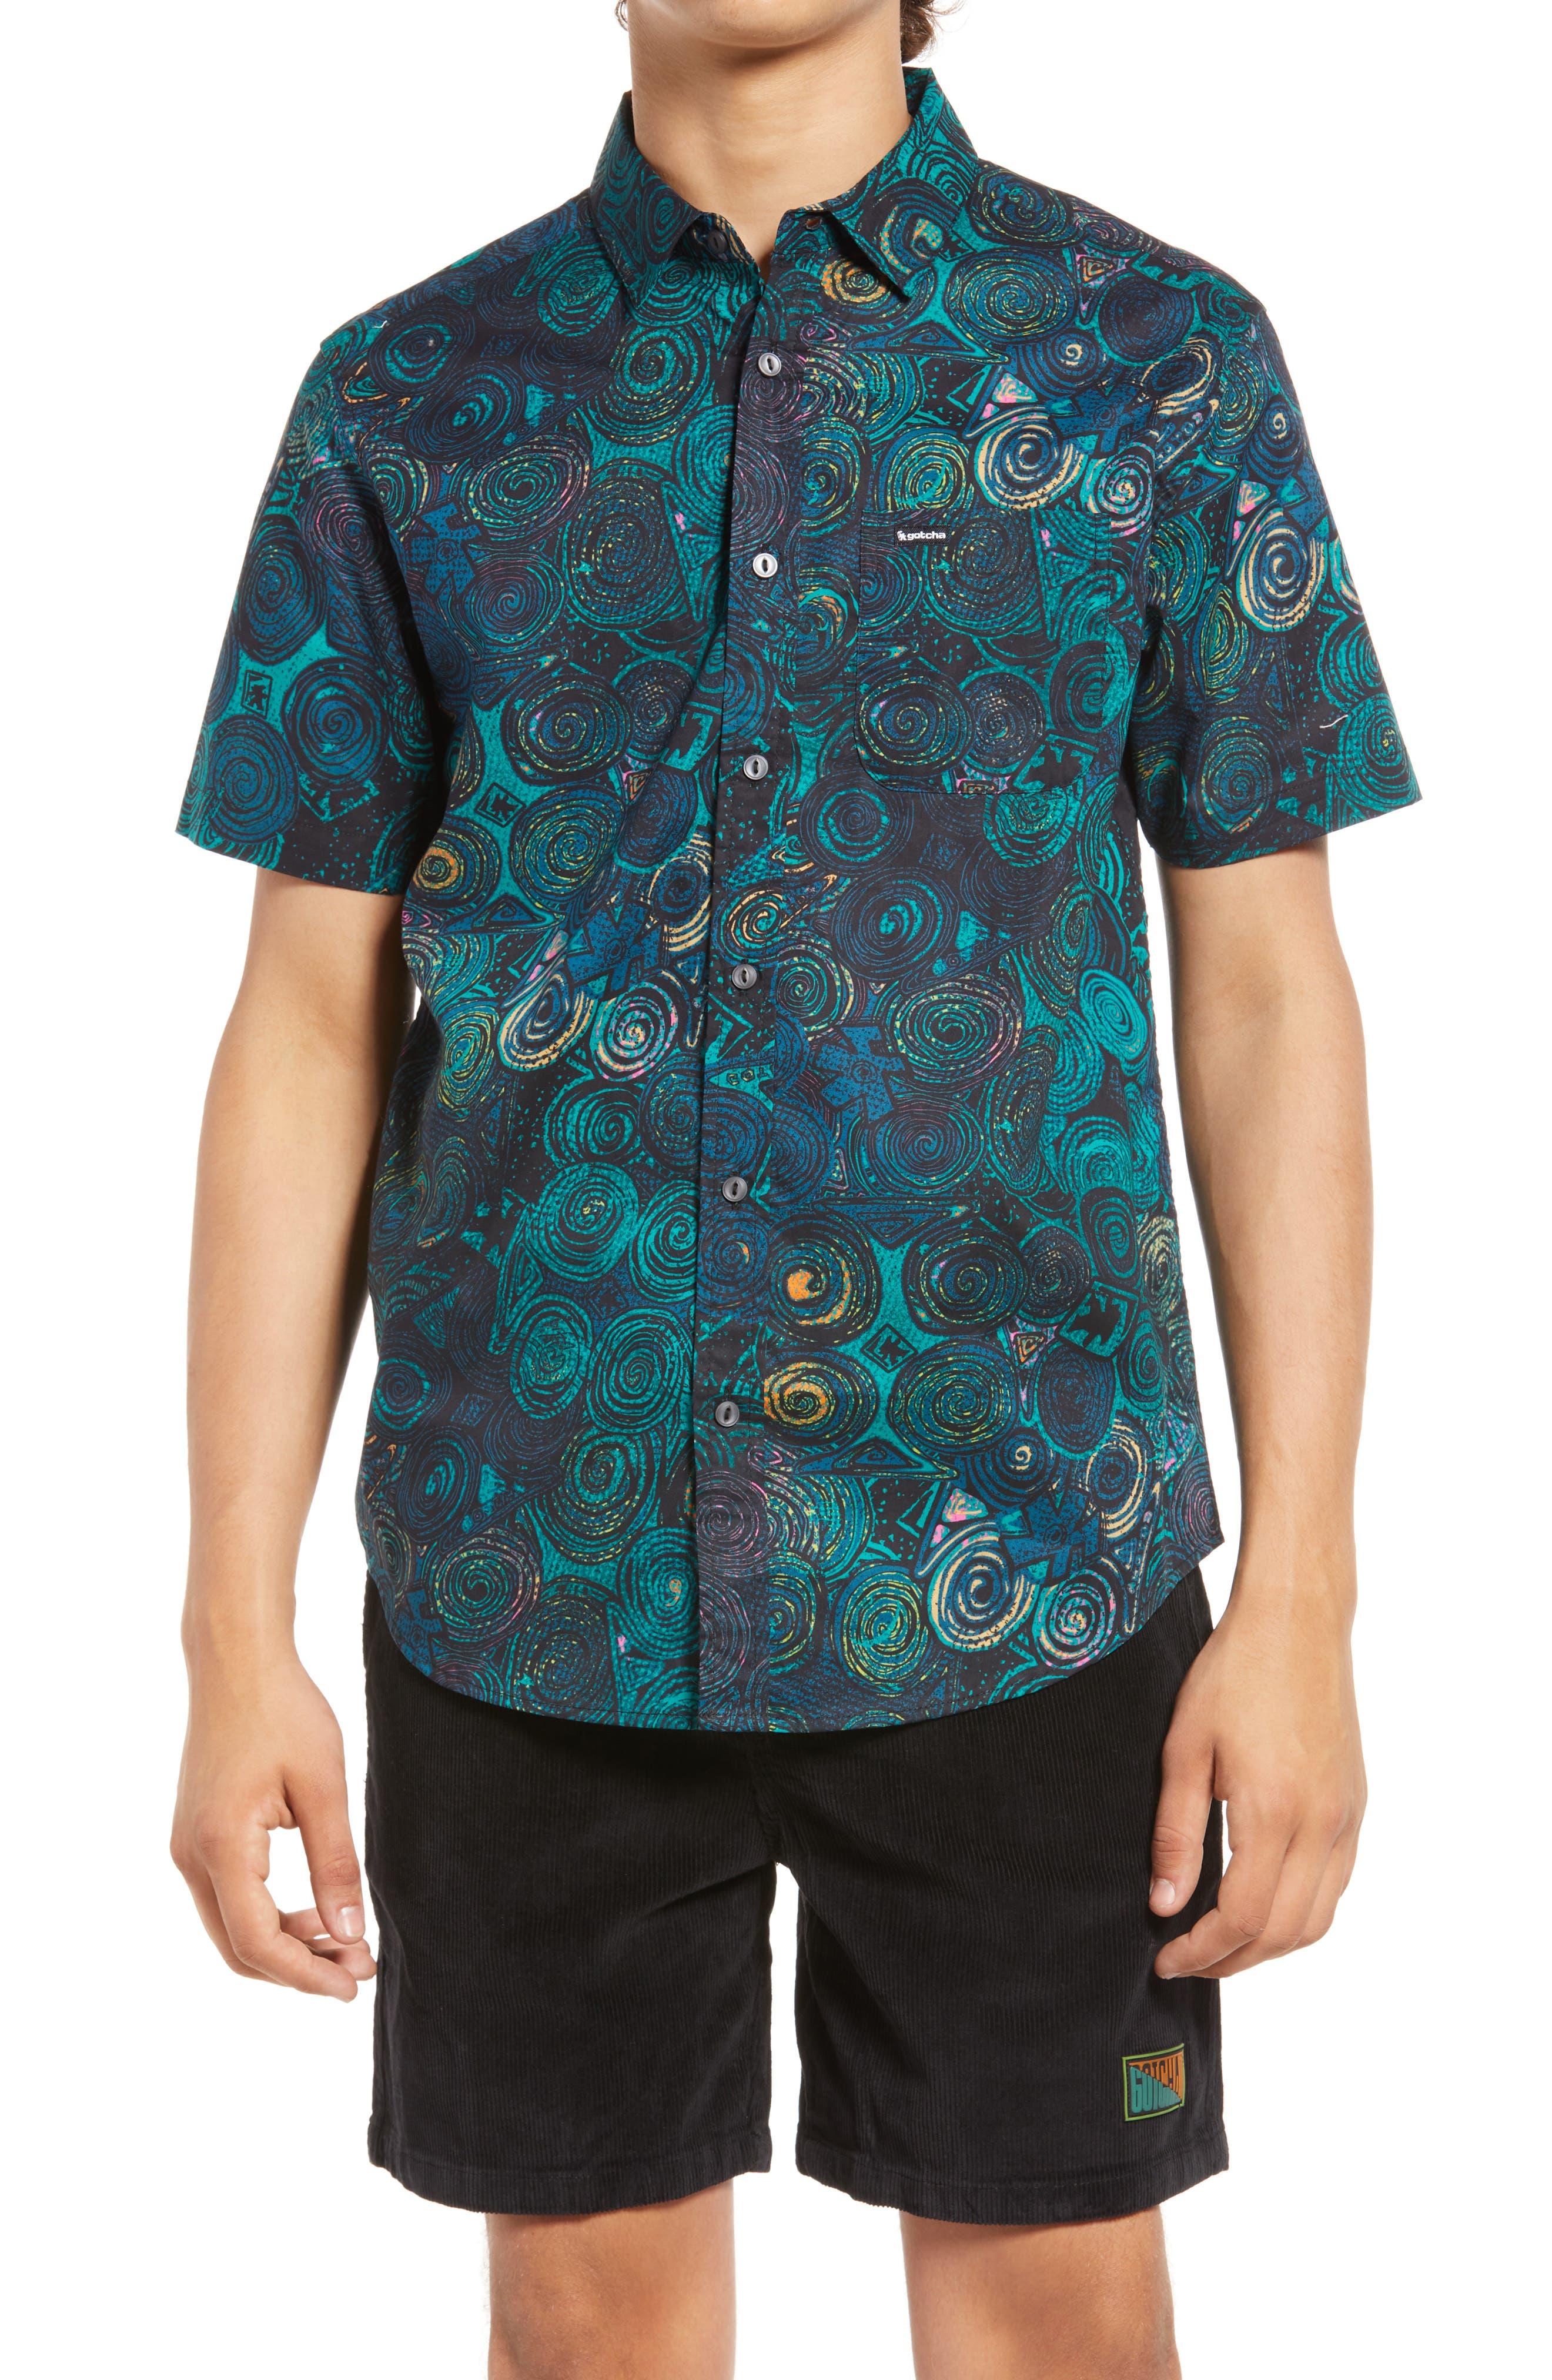 Smithson Swirl Print Short Sleeve Button-Up Shirt